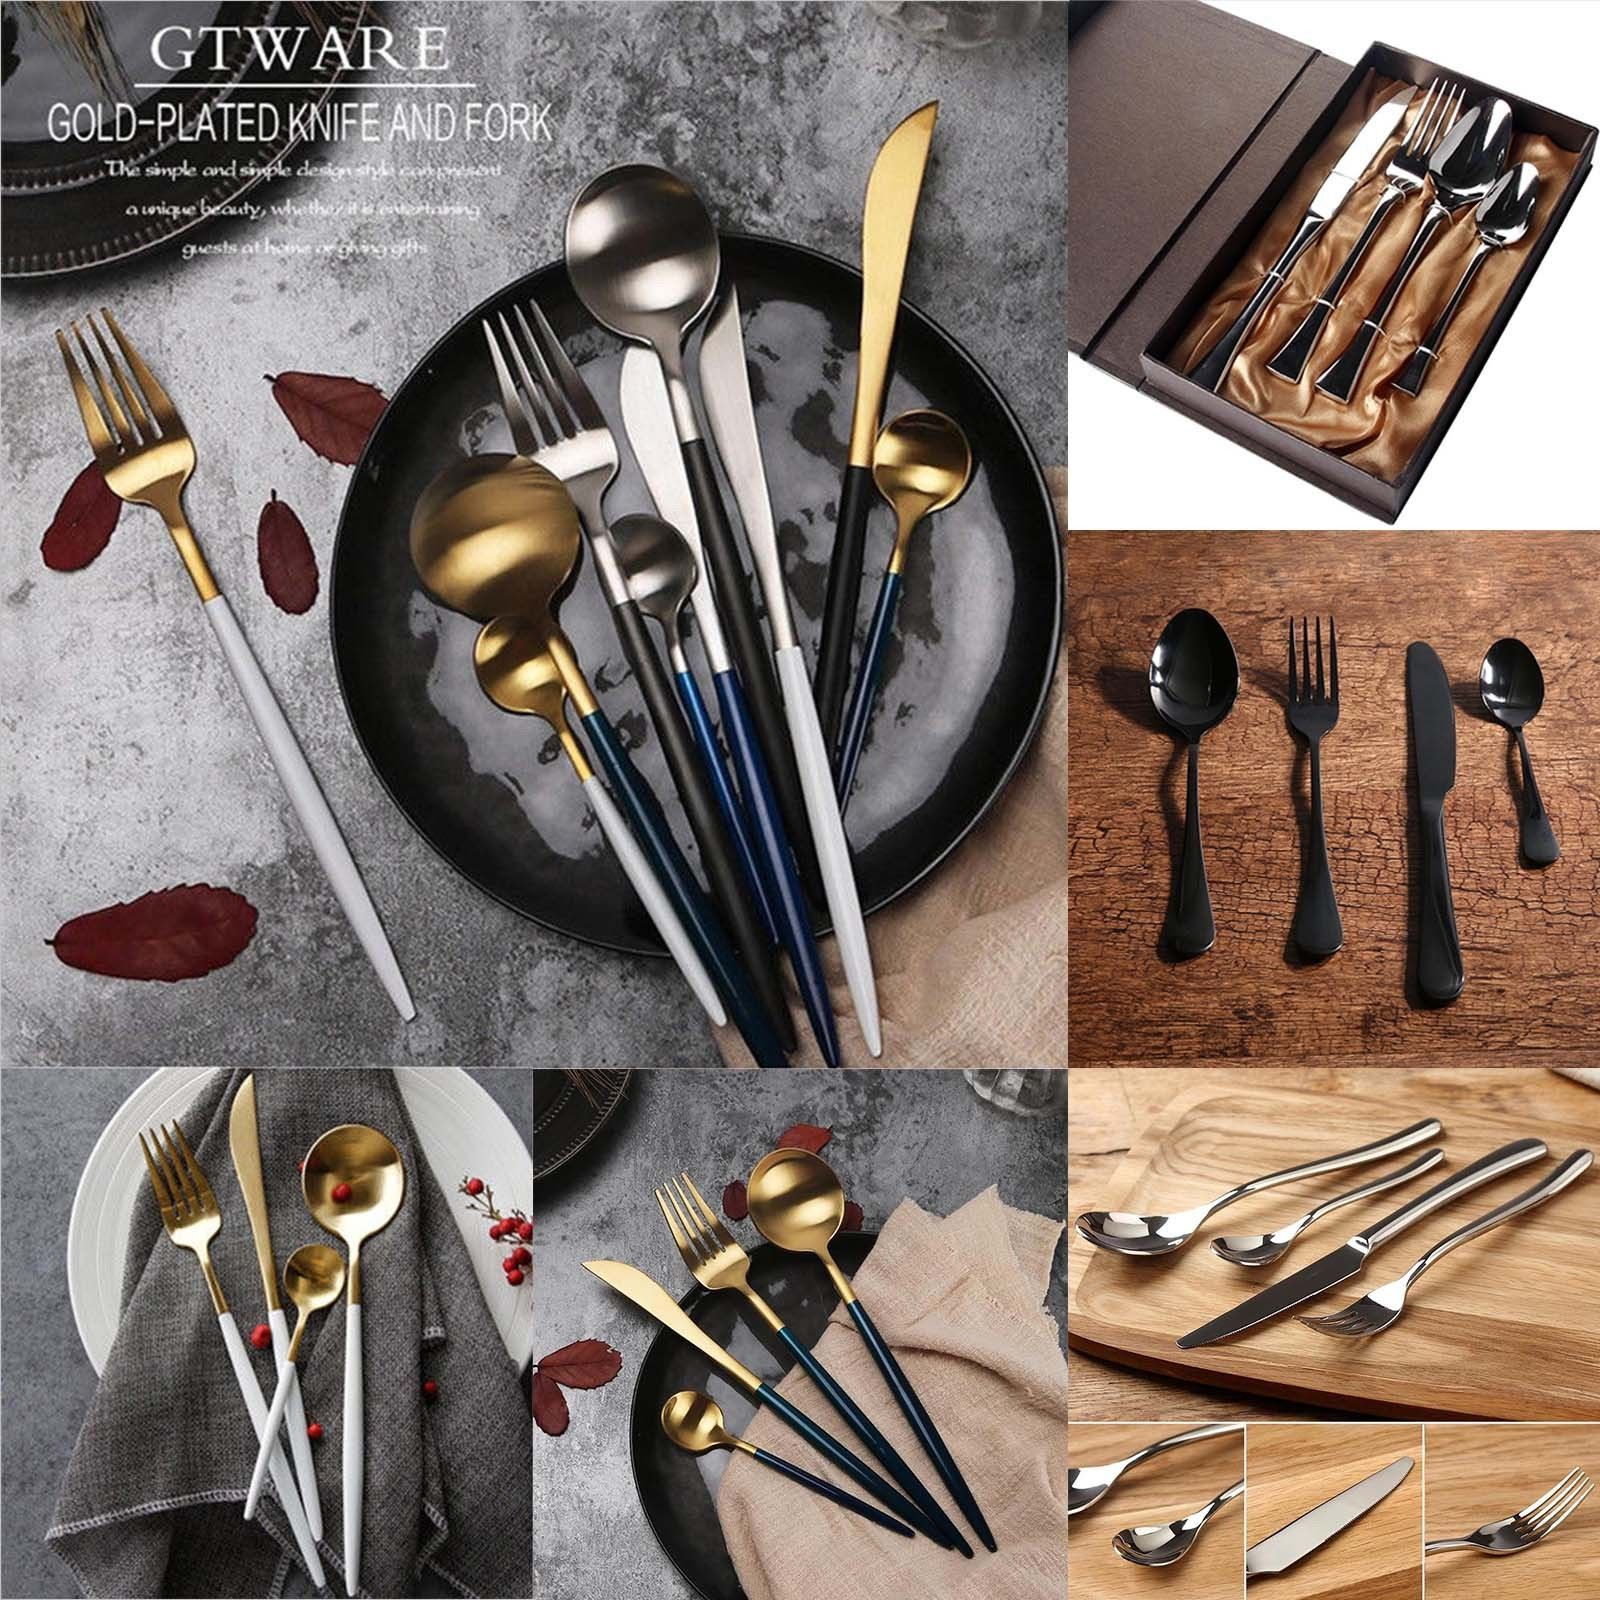 0 99 GBP 4 Pcs Gold Plated Cutlery Set Dinnerware Steel Fork Spoon